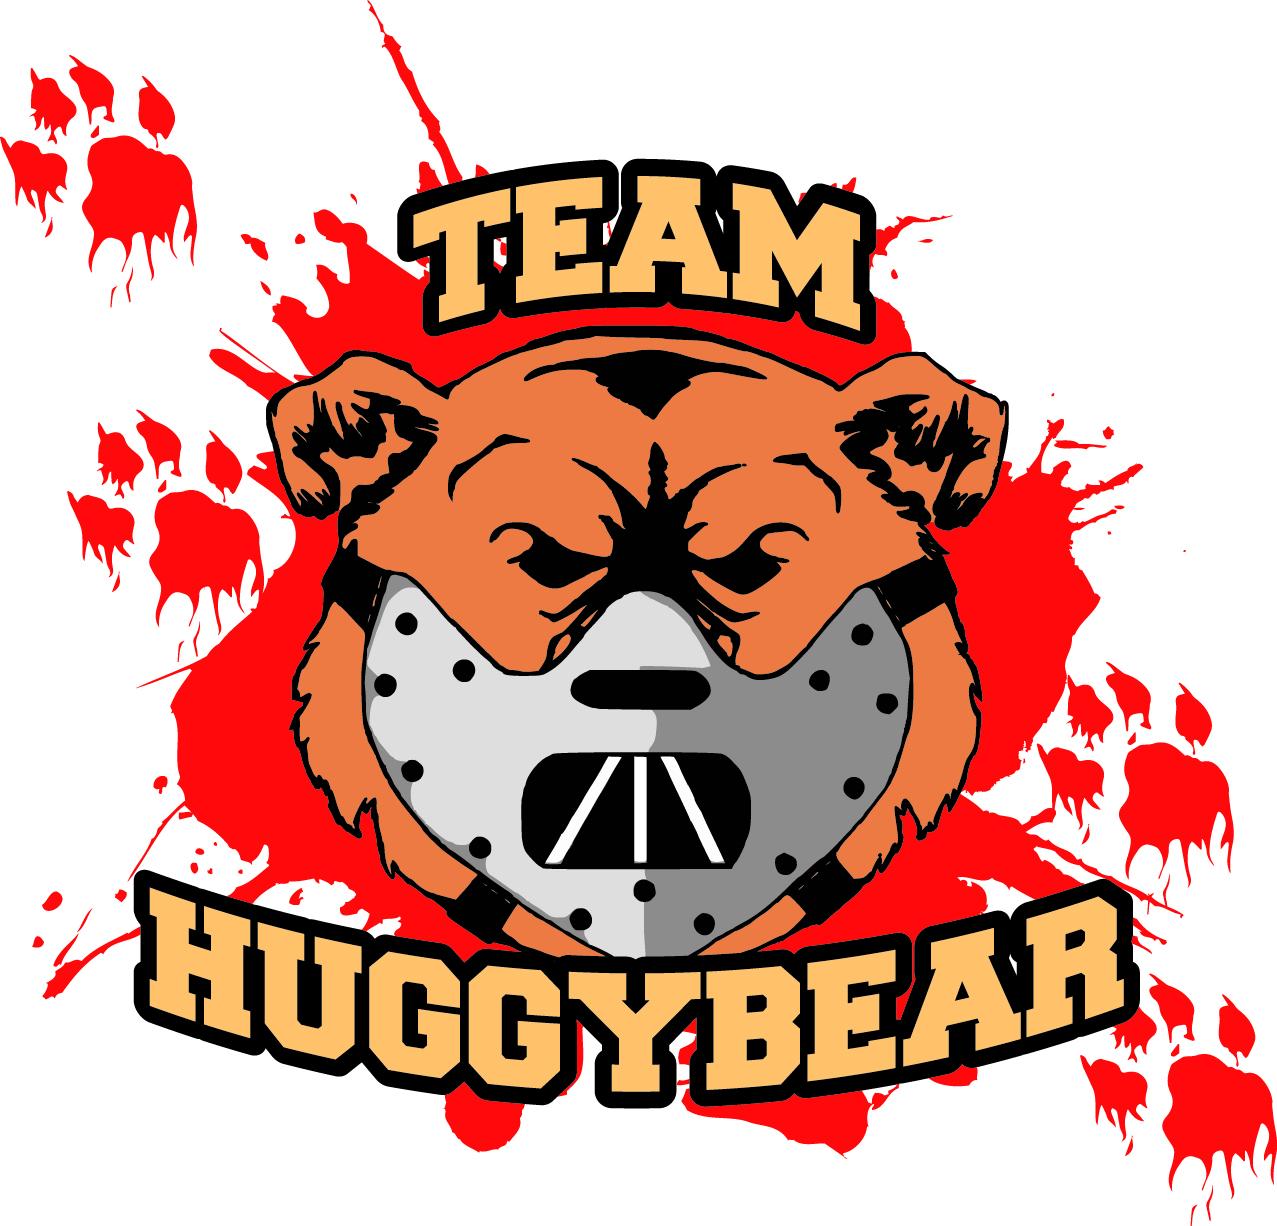 Team Huggybear